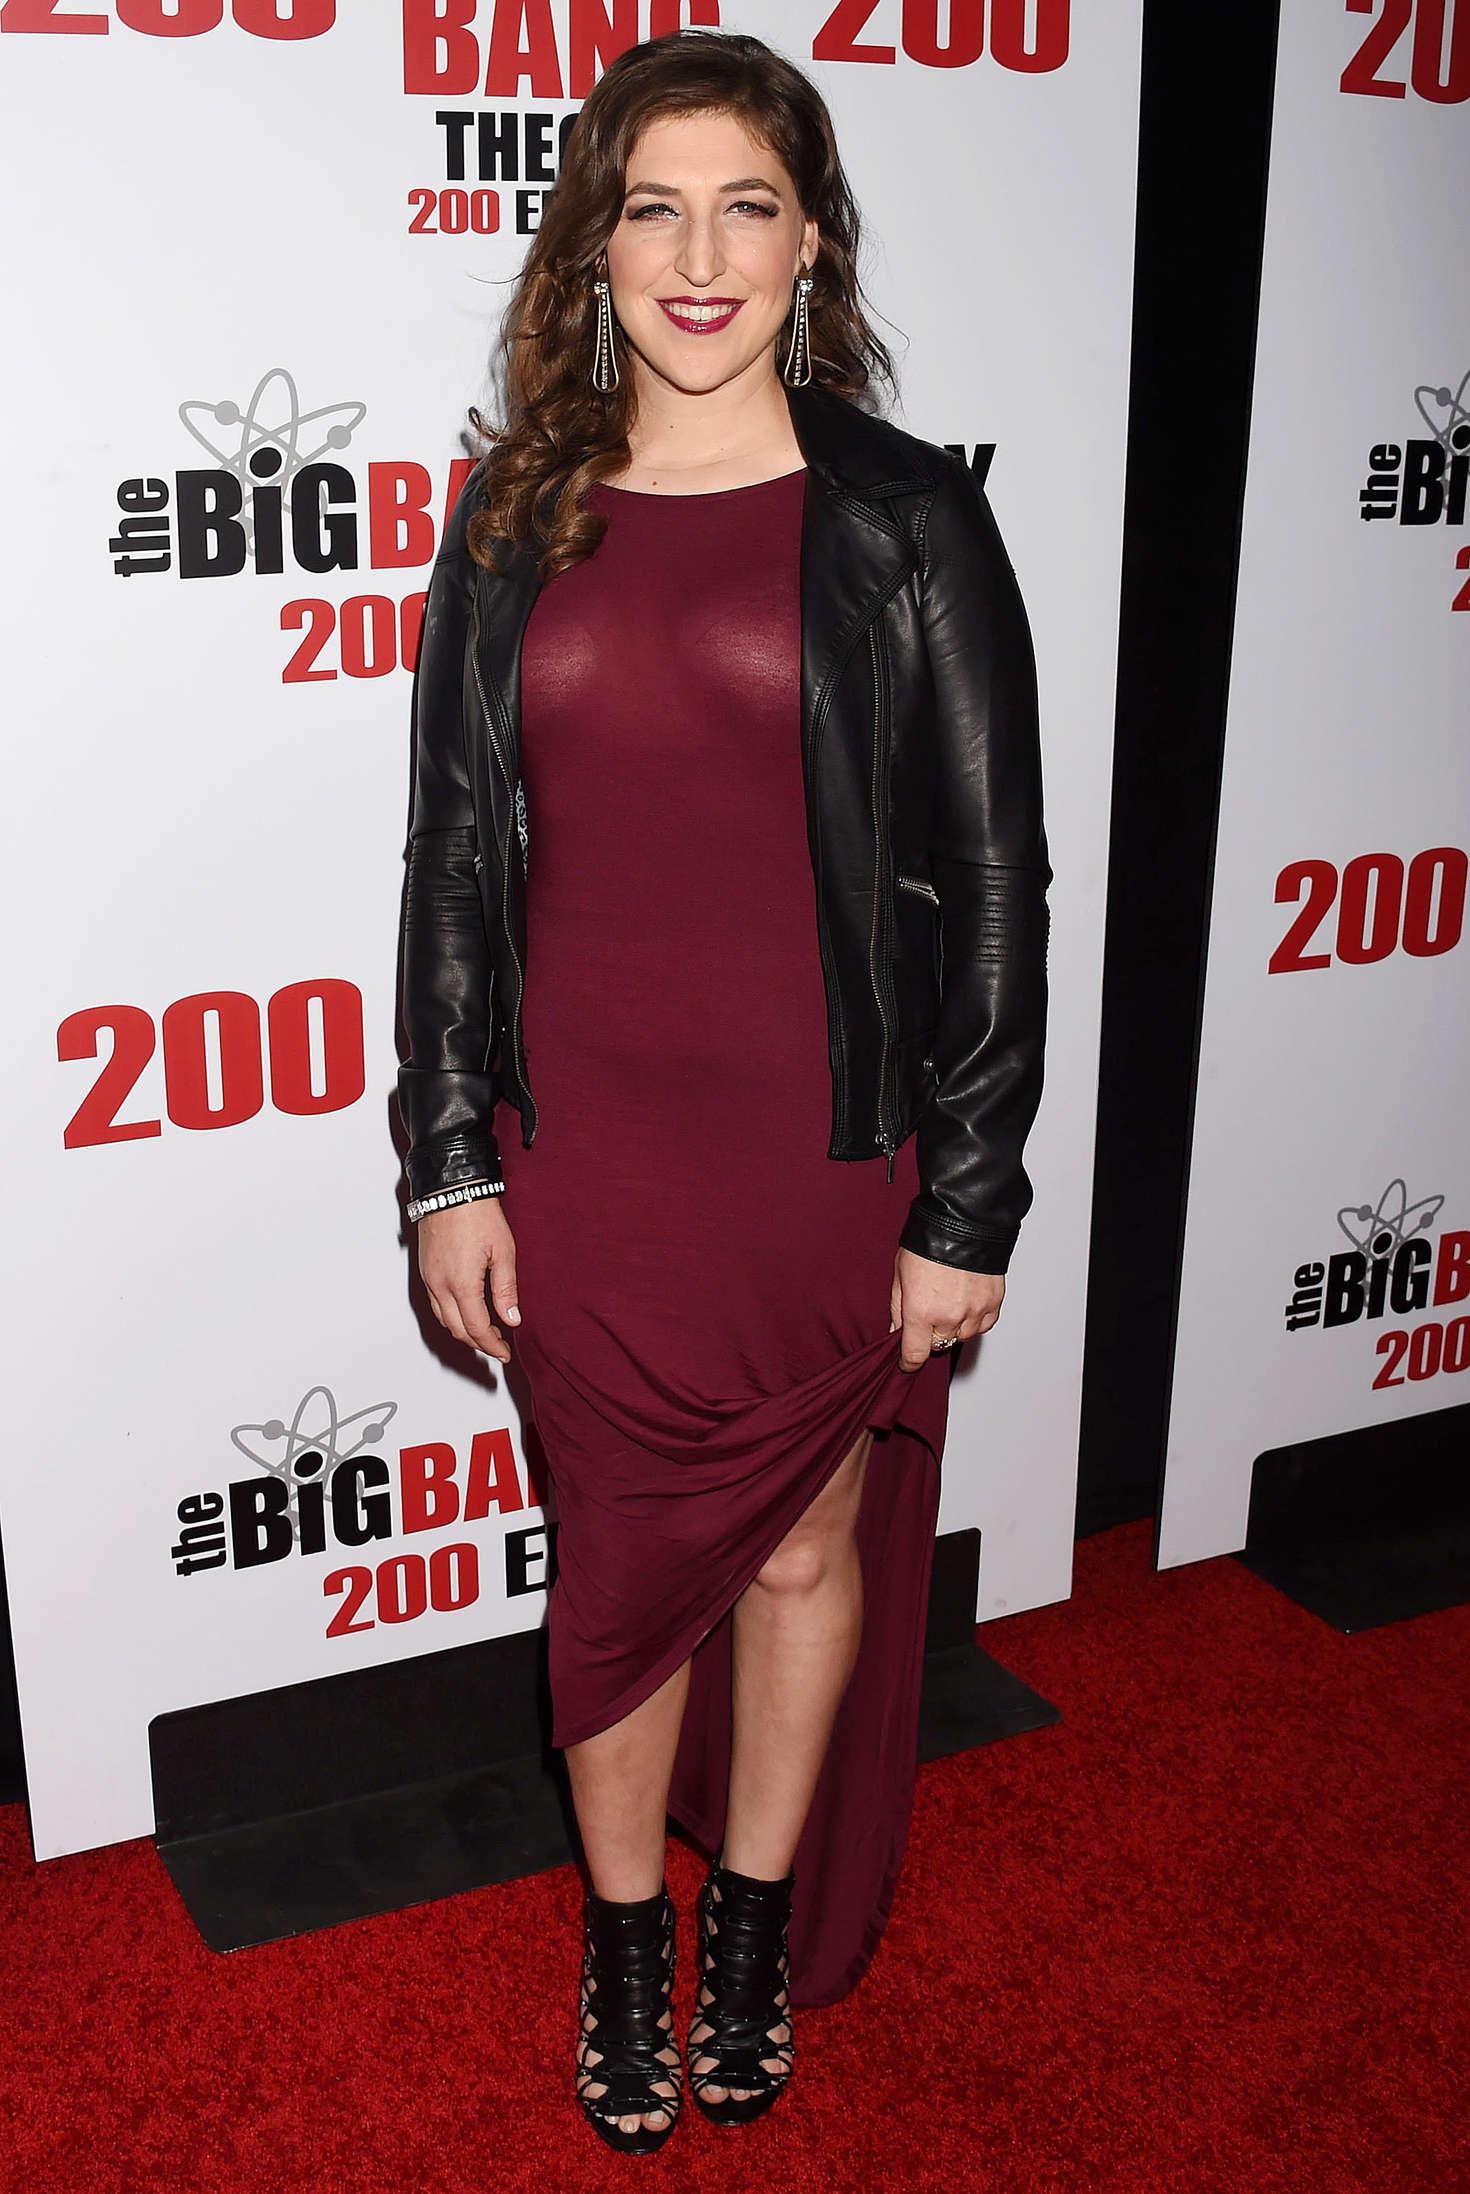 Mayim Bialik The Big Bang Theory Episode Celebration in Los Angeles